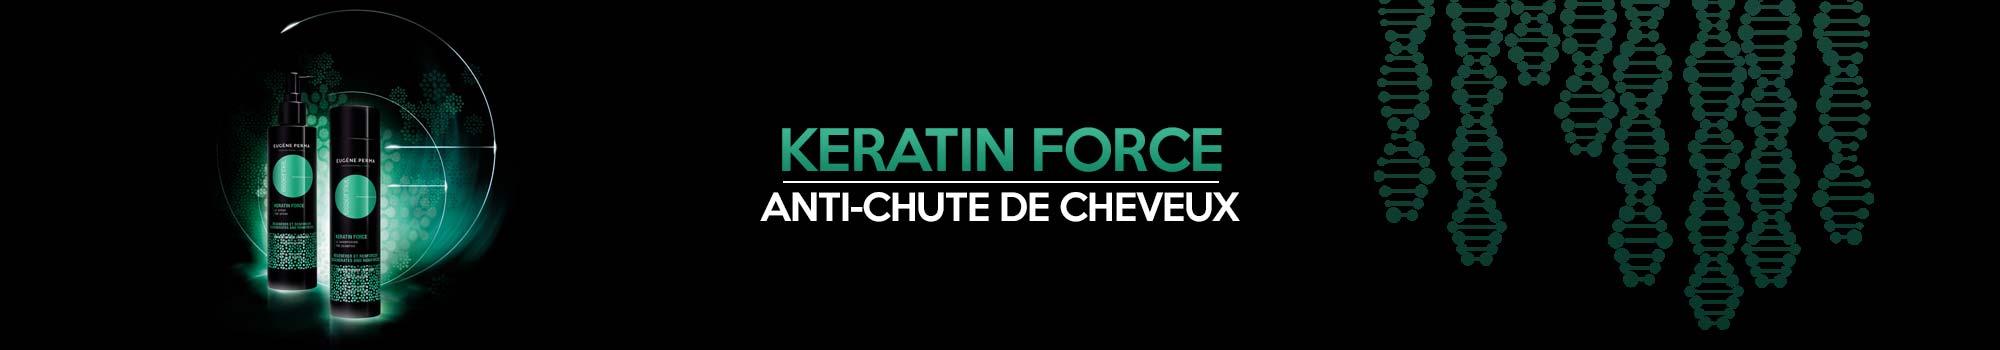 Keratin Force Eugène Perma